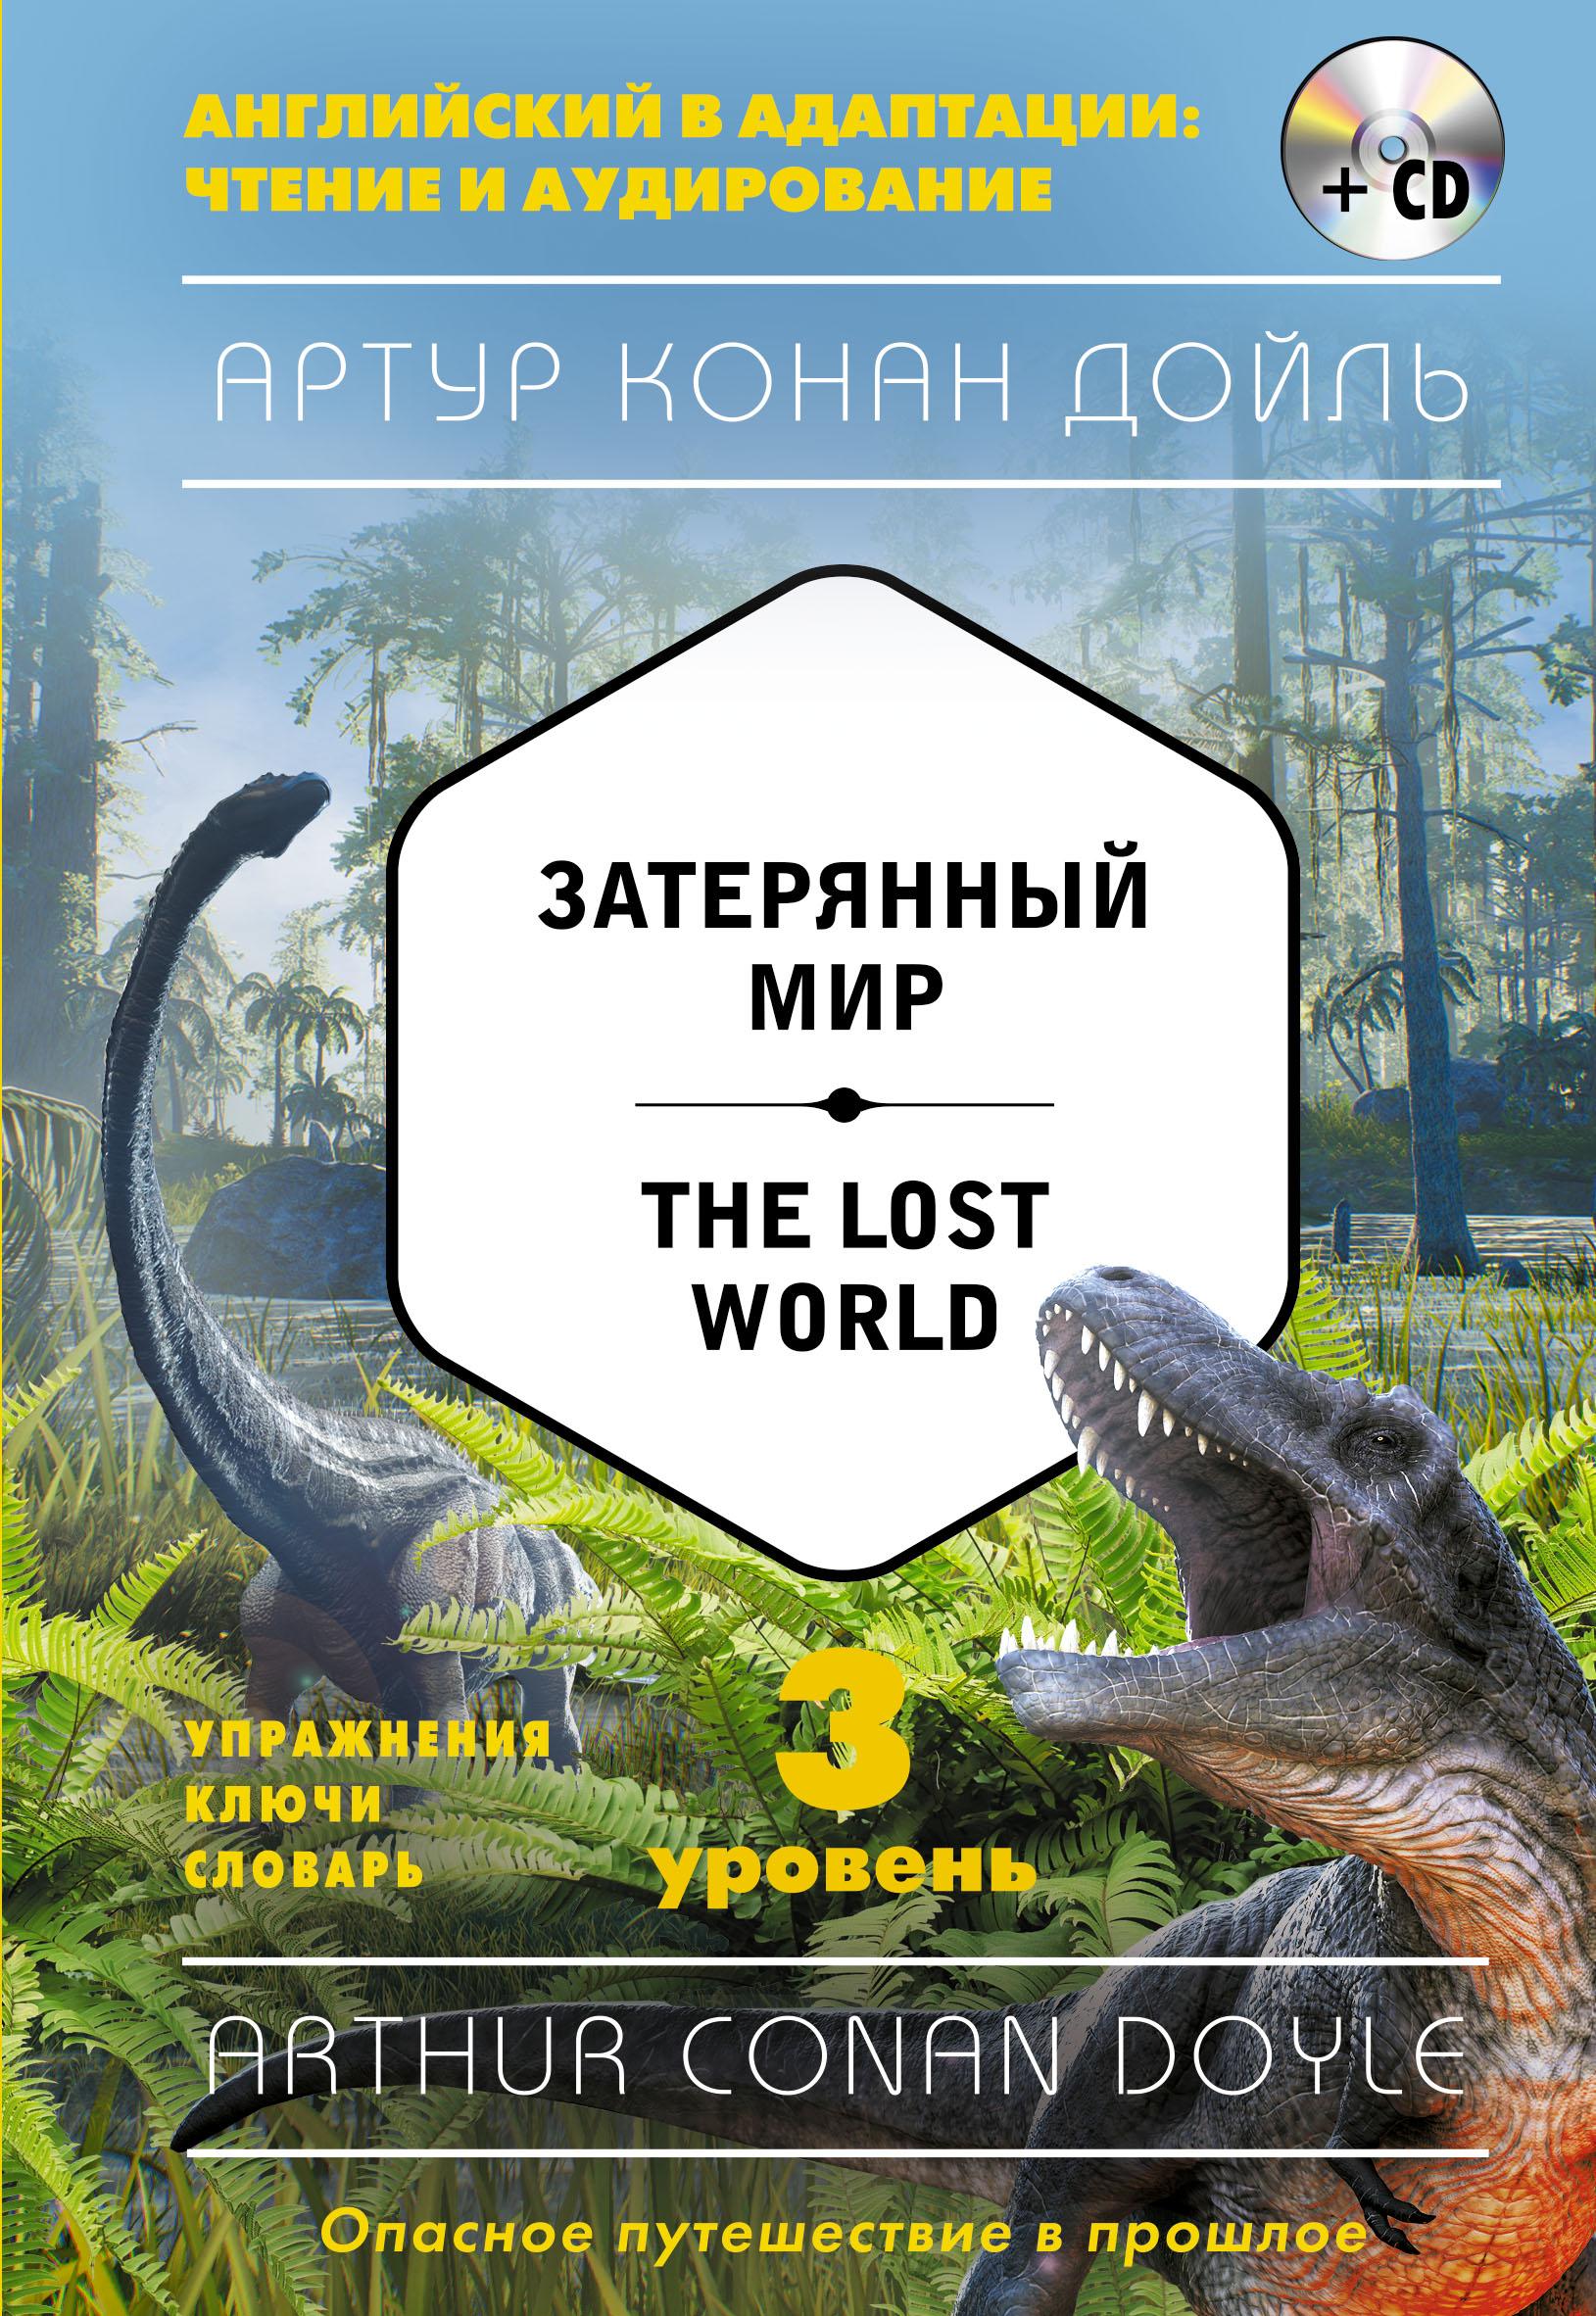 Дойл Артур Конан Затерянный мир / The Lost World (+ CD). 3-й уровень дойль а затерянный мир the lost world 3 уровень упражнения ключи словари cd